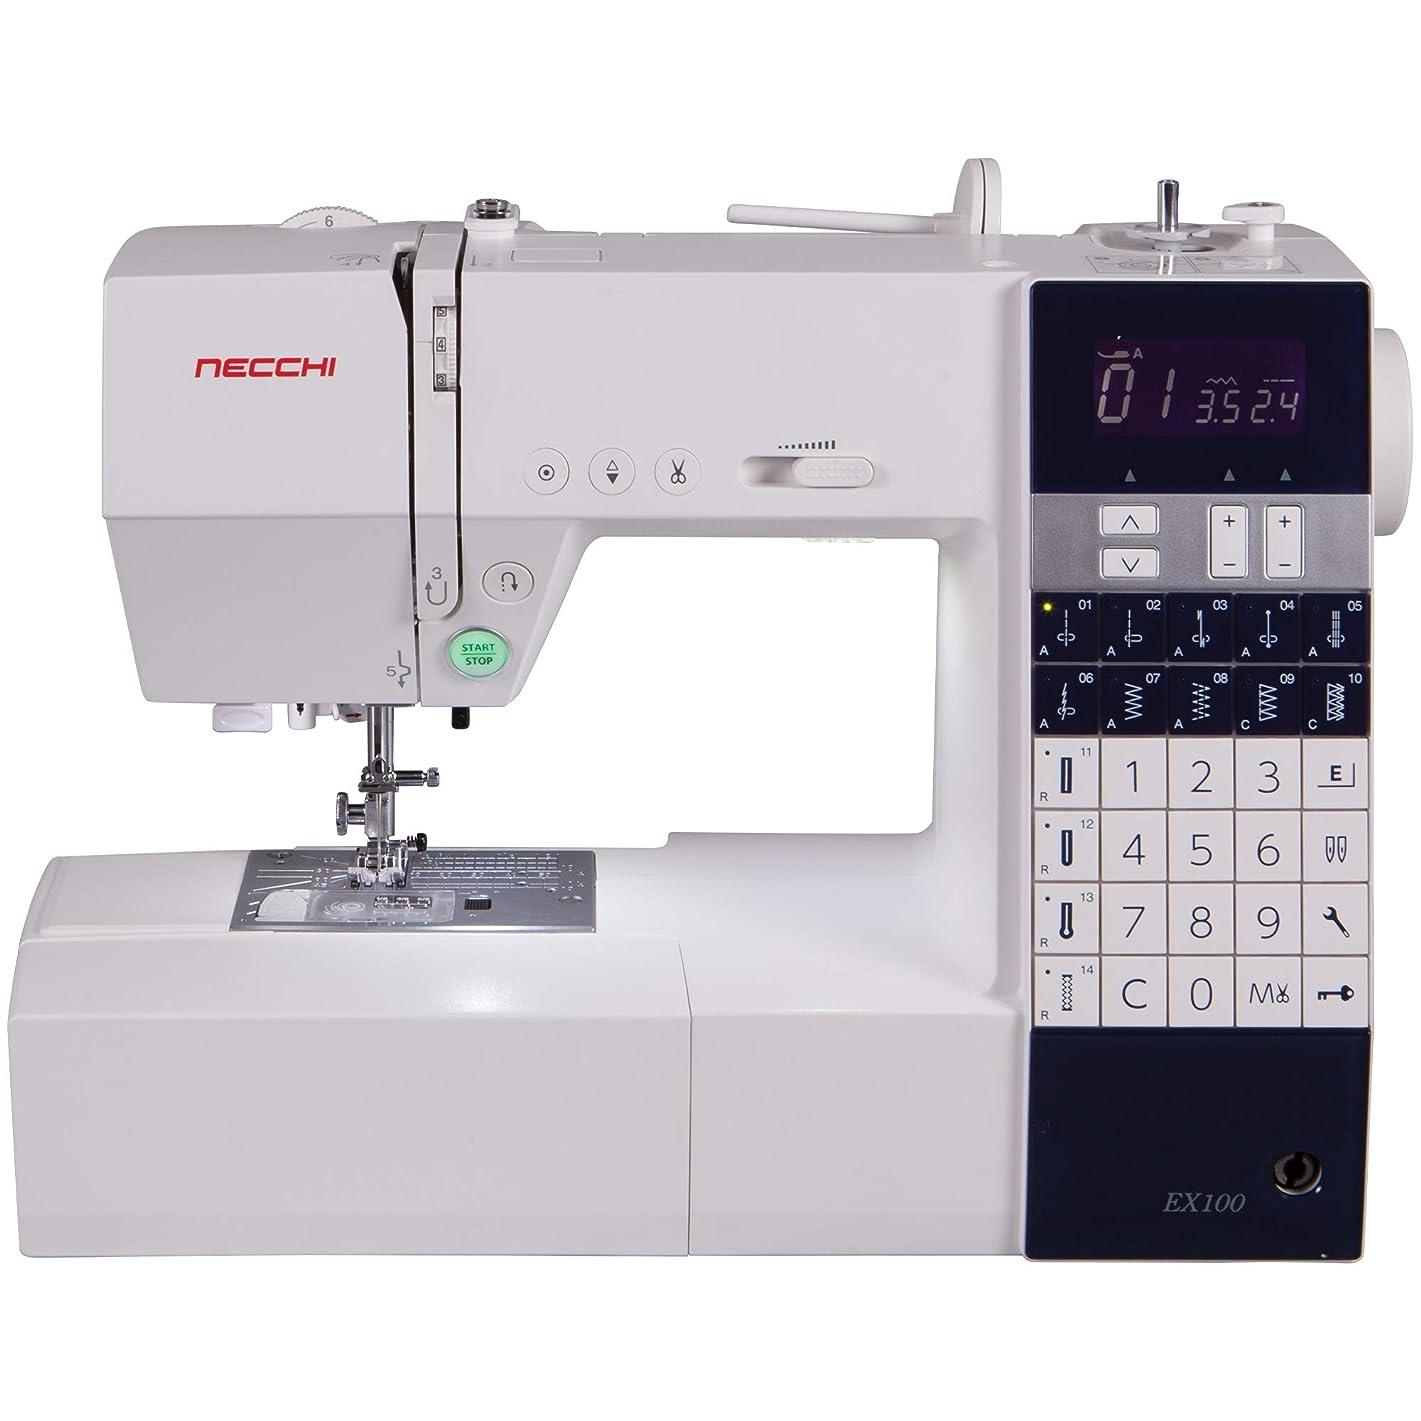 Necchi EX100 Sewing Machine, White